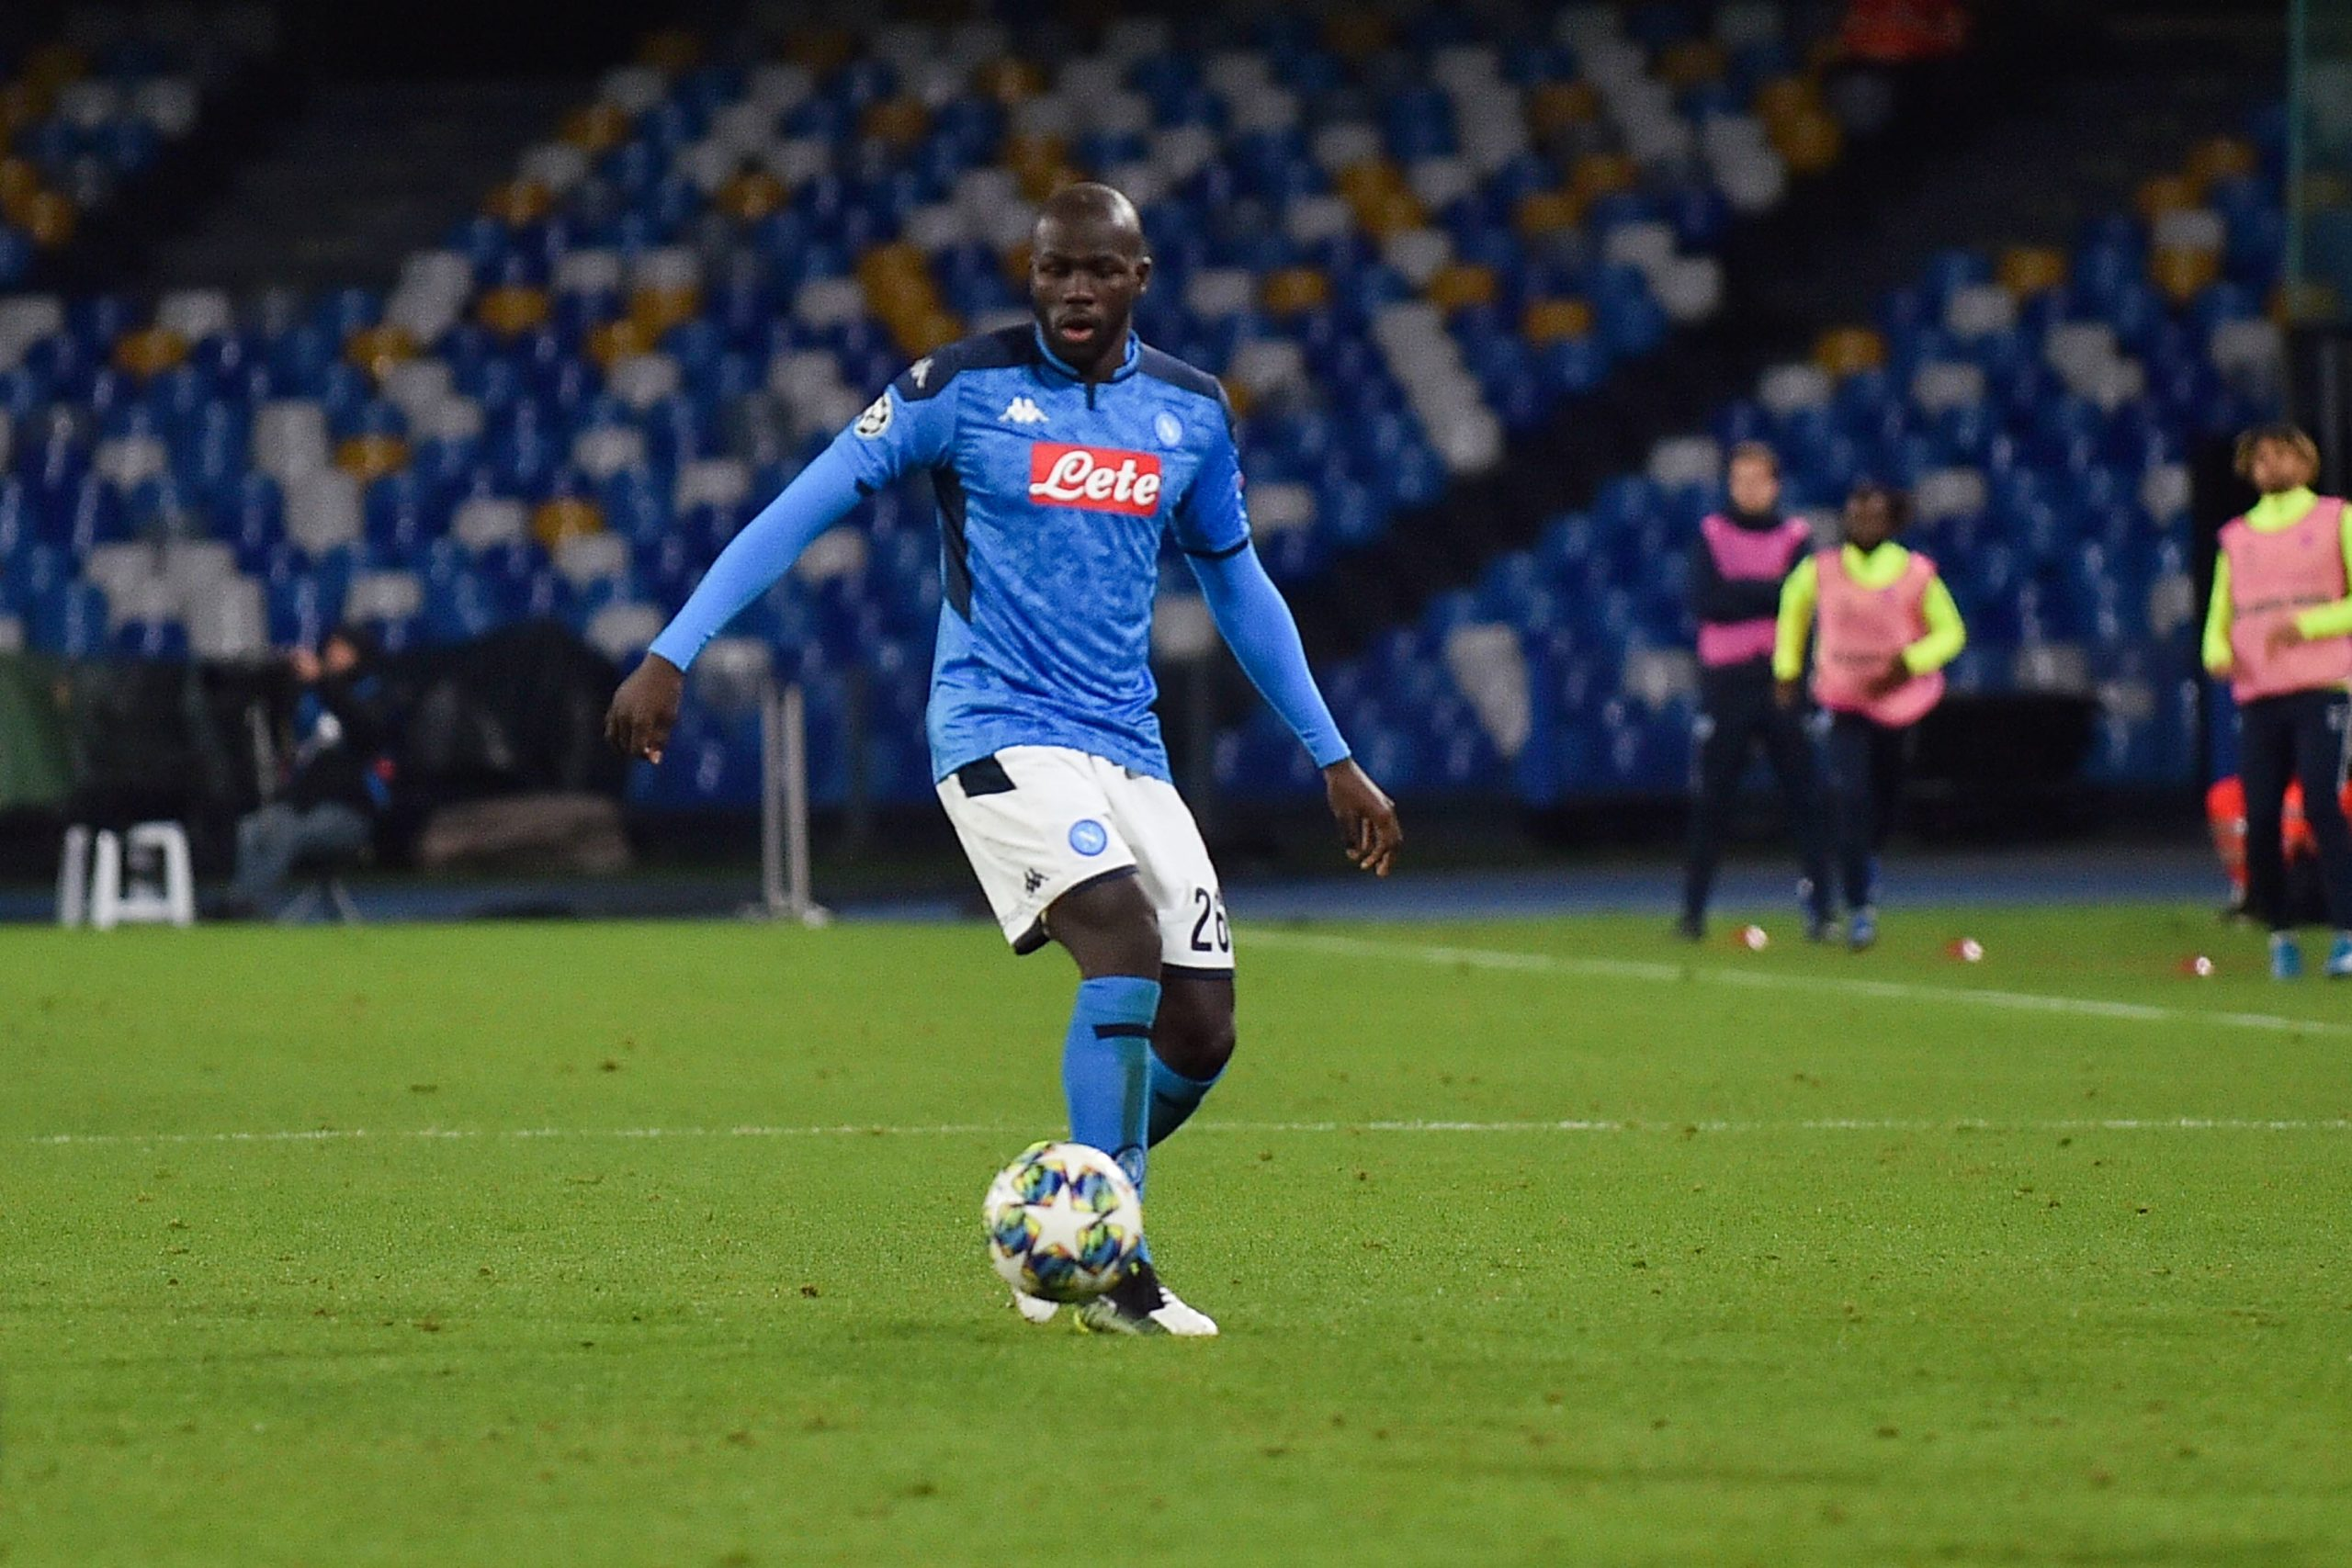 Mercato - Manchester United aussi pense à Koulibaly et le prix monte selon La Repubblica